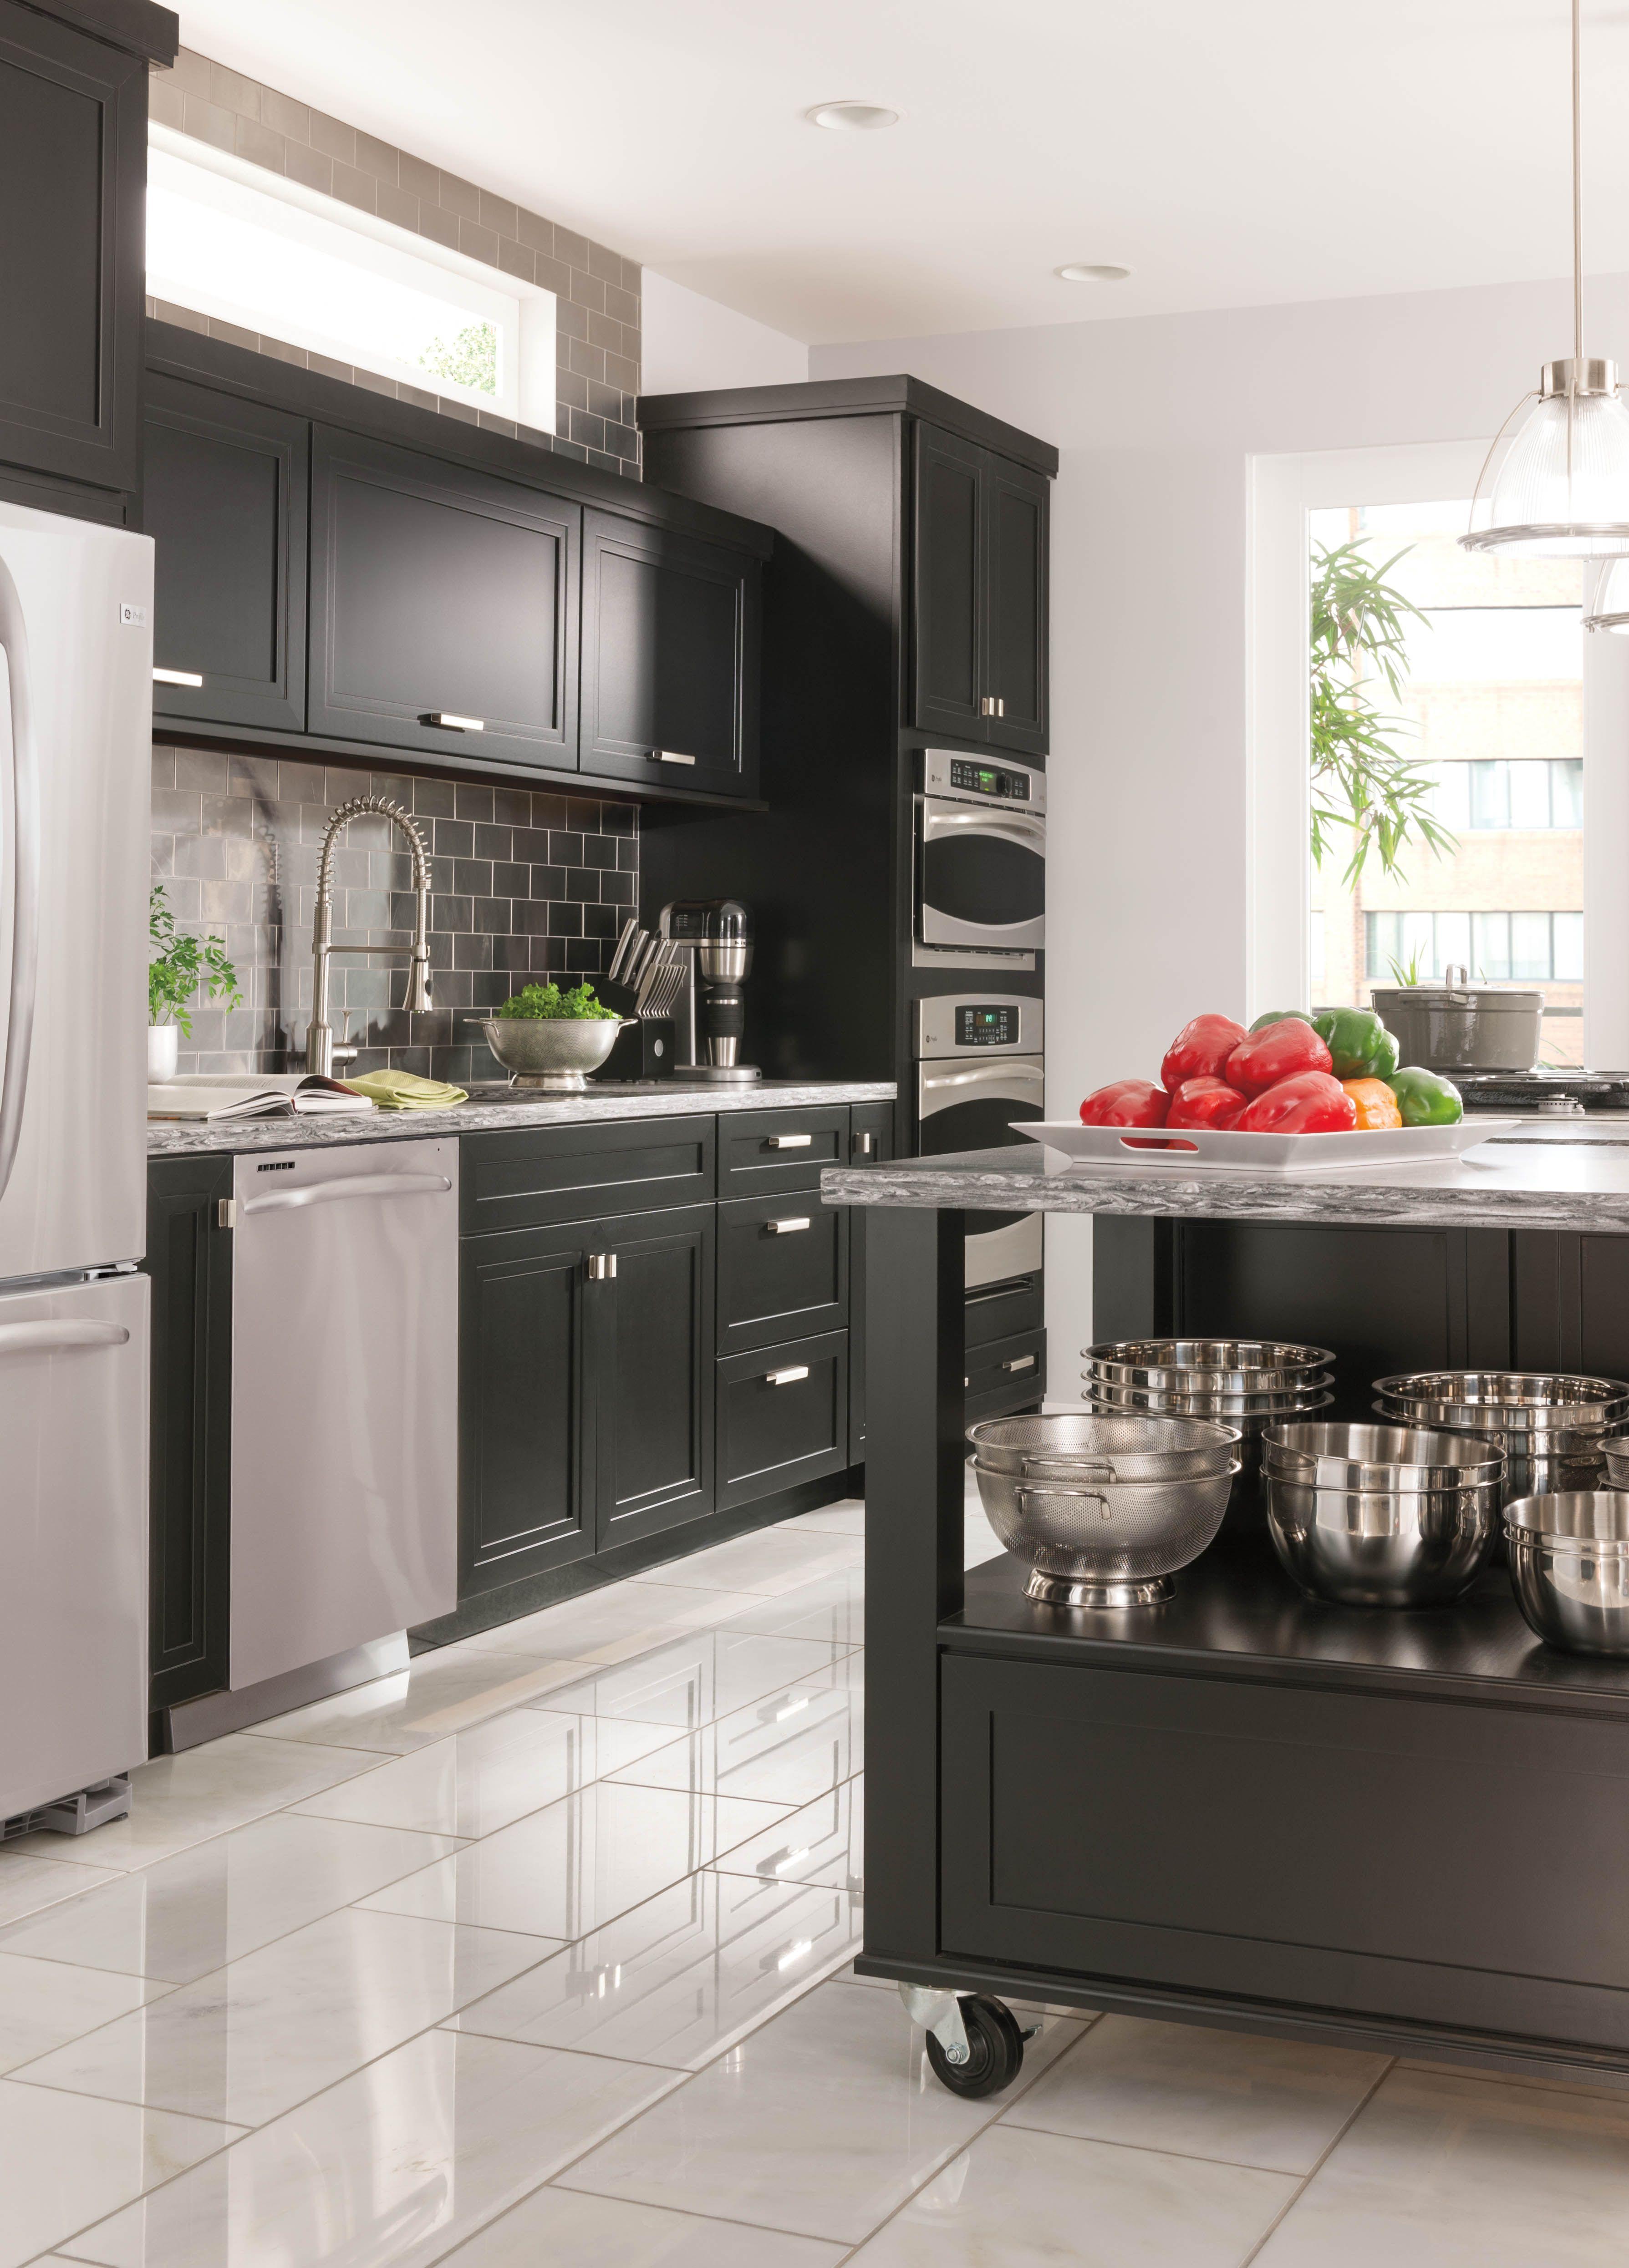 Martha Stewart Living Kitchen At The Home Depot Kitchen Layout Home Kitchens Kitchen Tiles Design